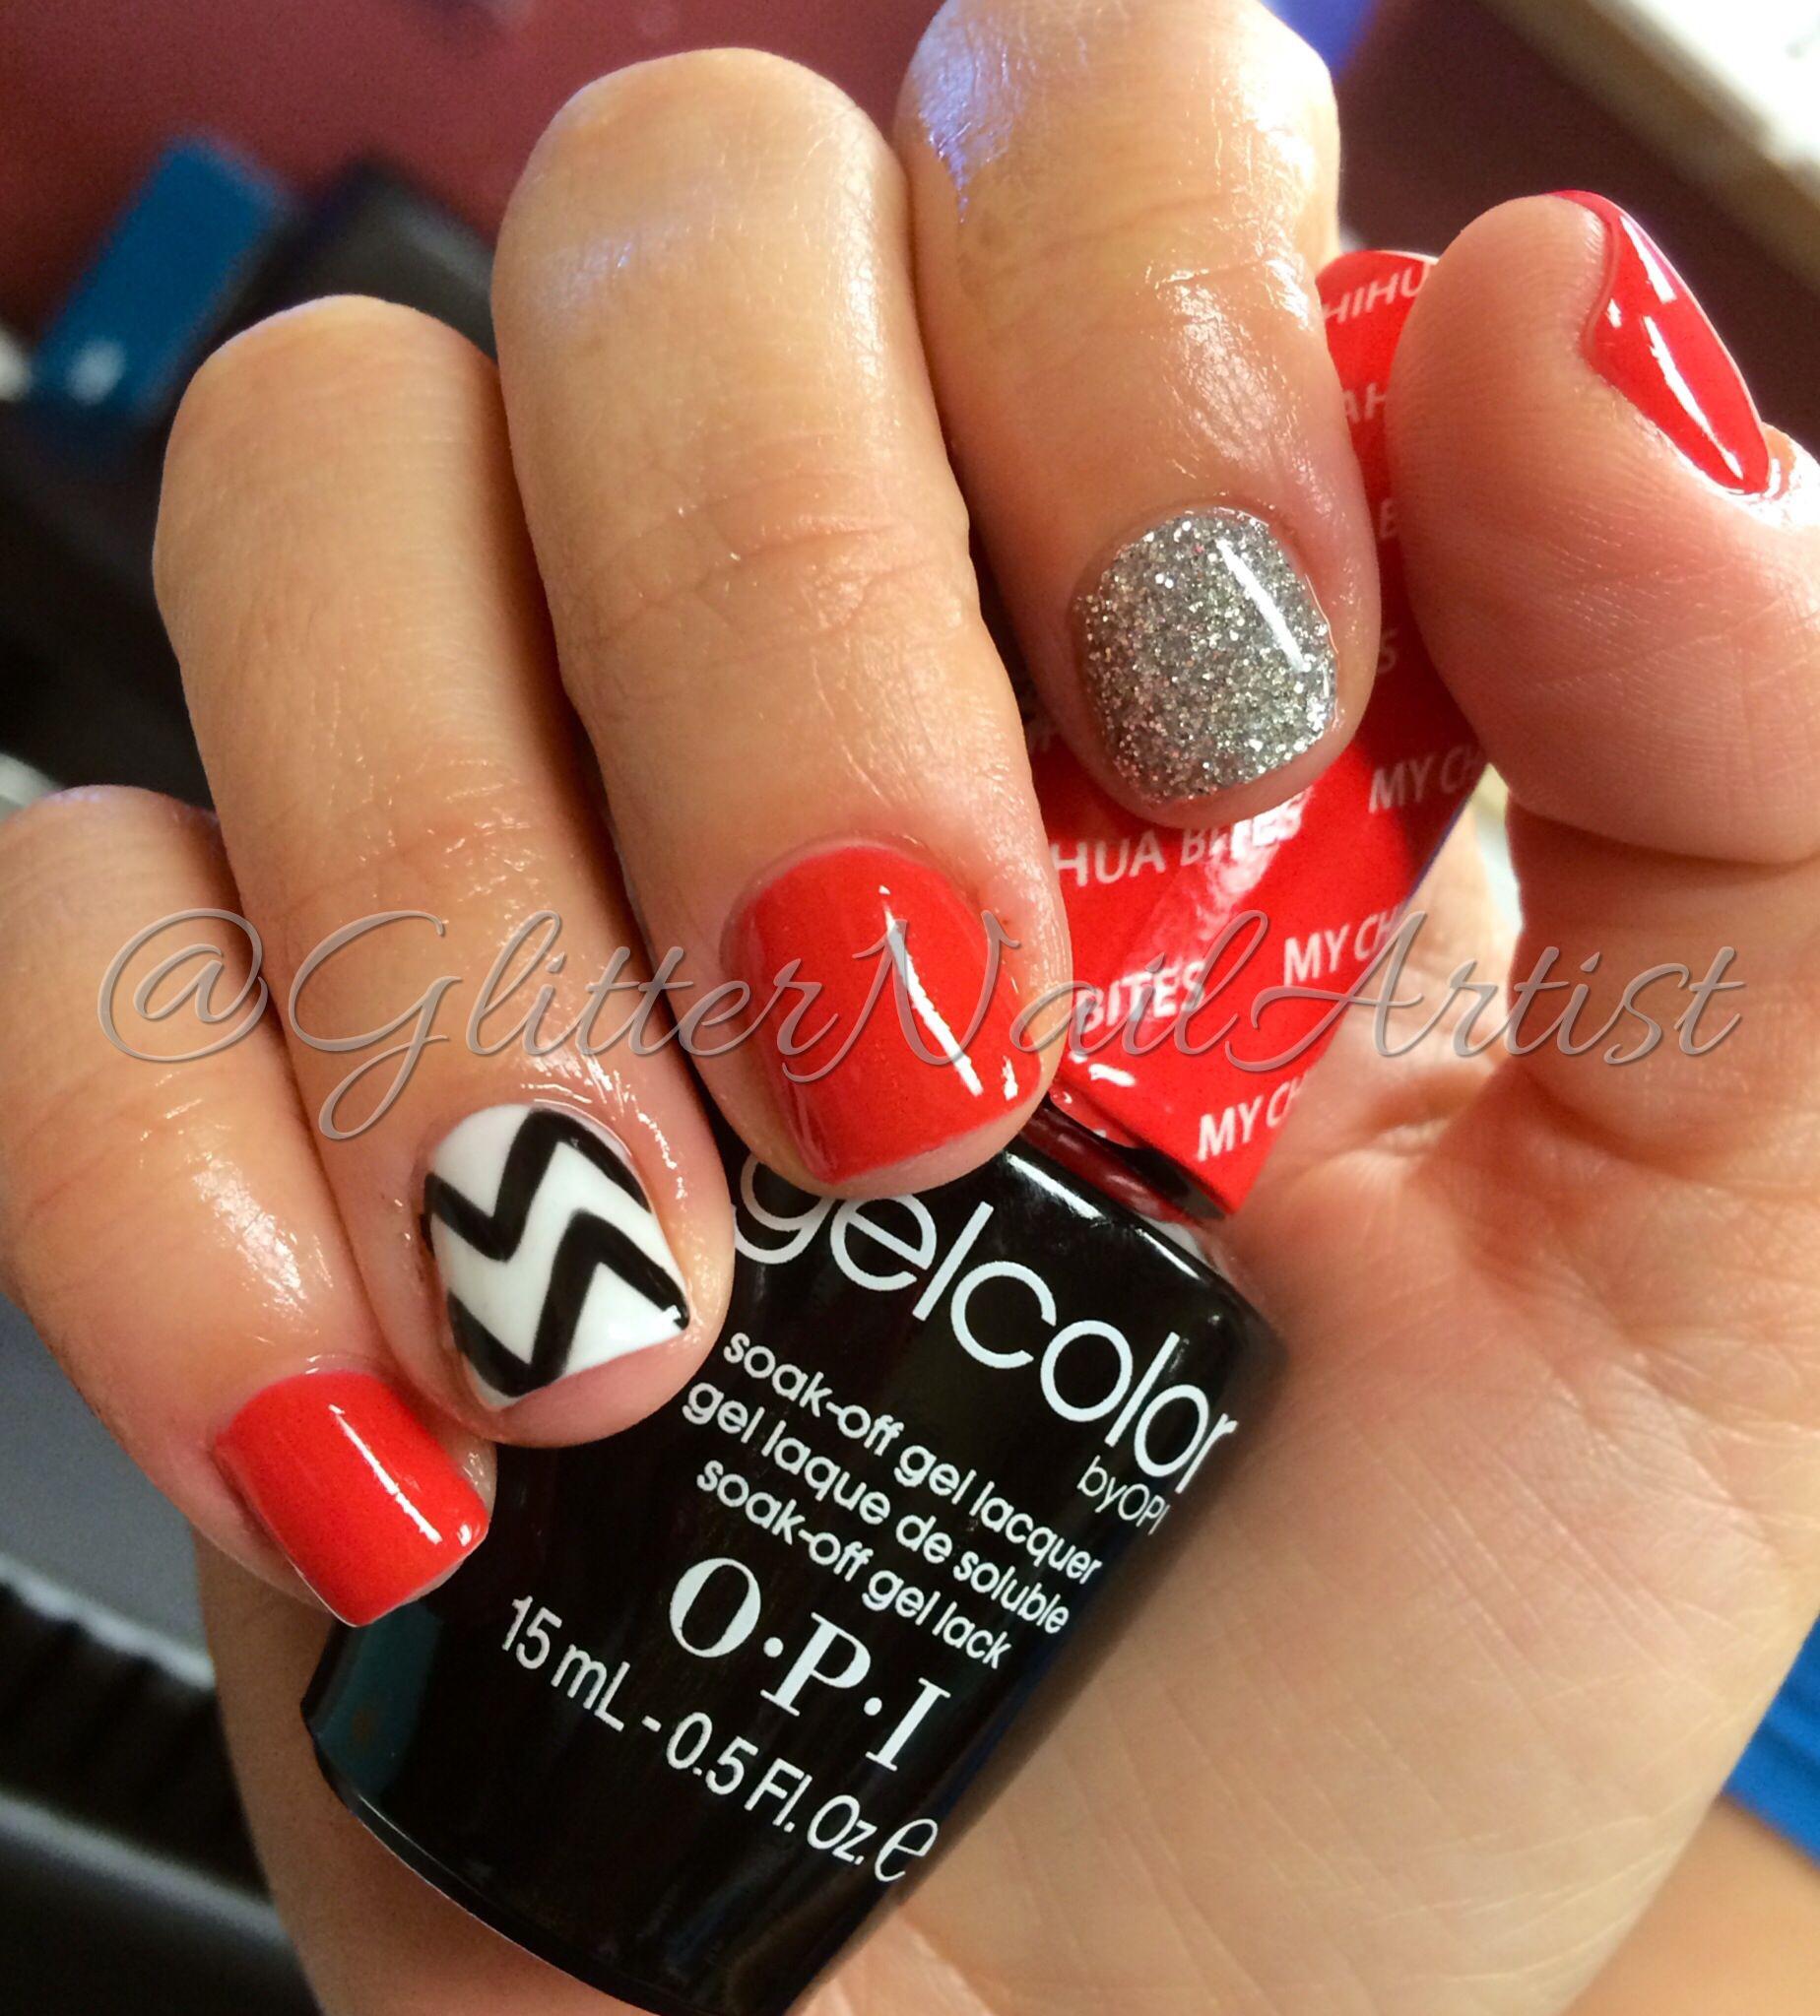 GlitterNailArtist  Fun Summer Nails! Chevron nails, accent nail ...